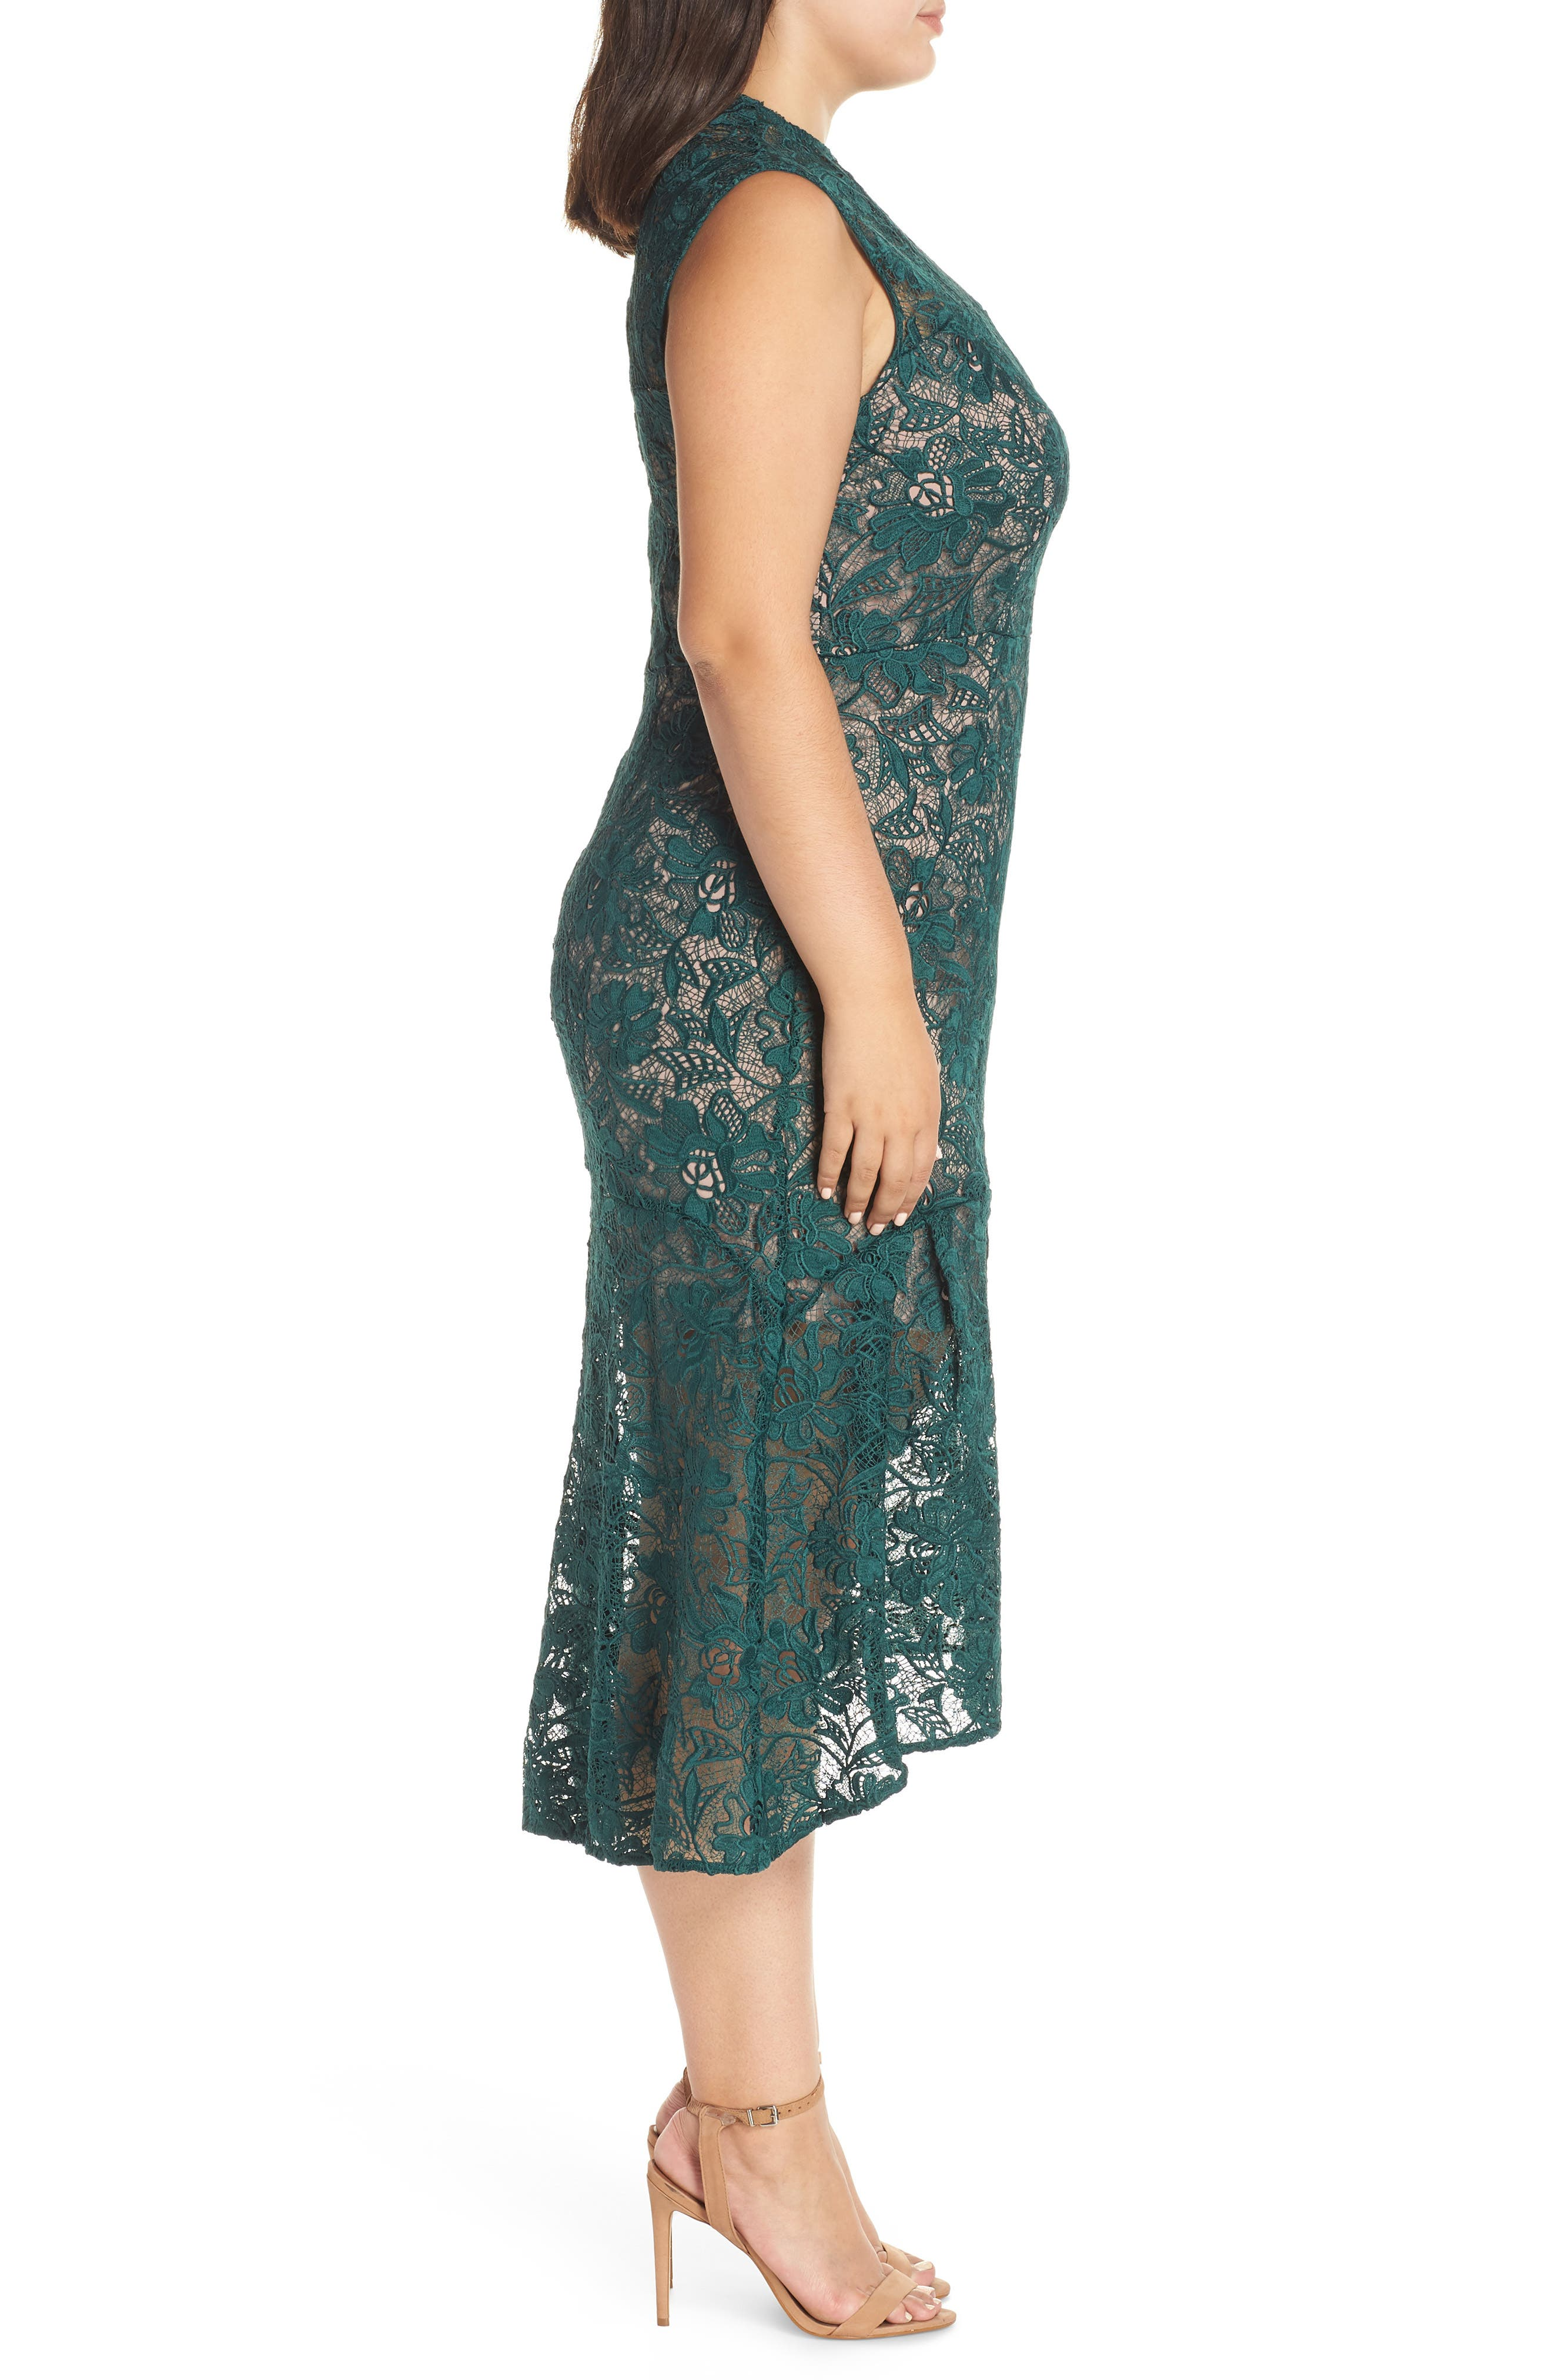 Chesea28 Lace Mock Neck Midi Dress,                             Alternate thumbnail 3, color,                             GREEN PARK